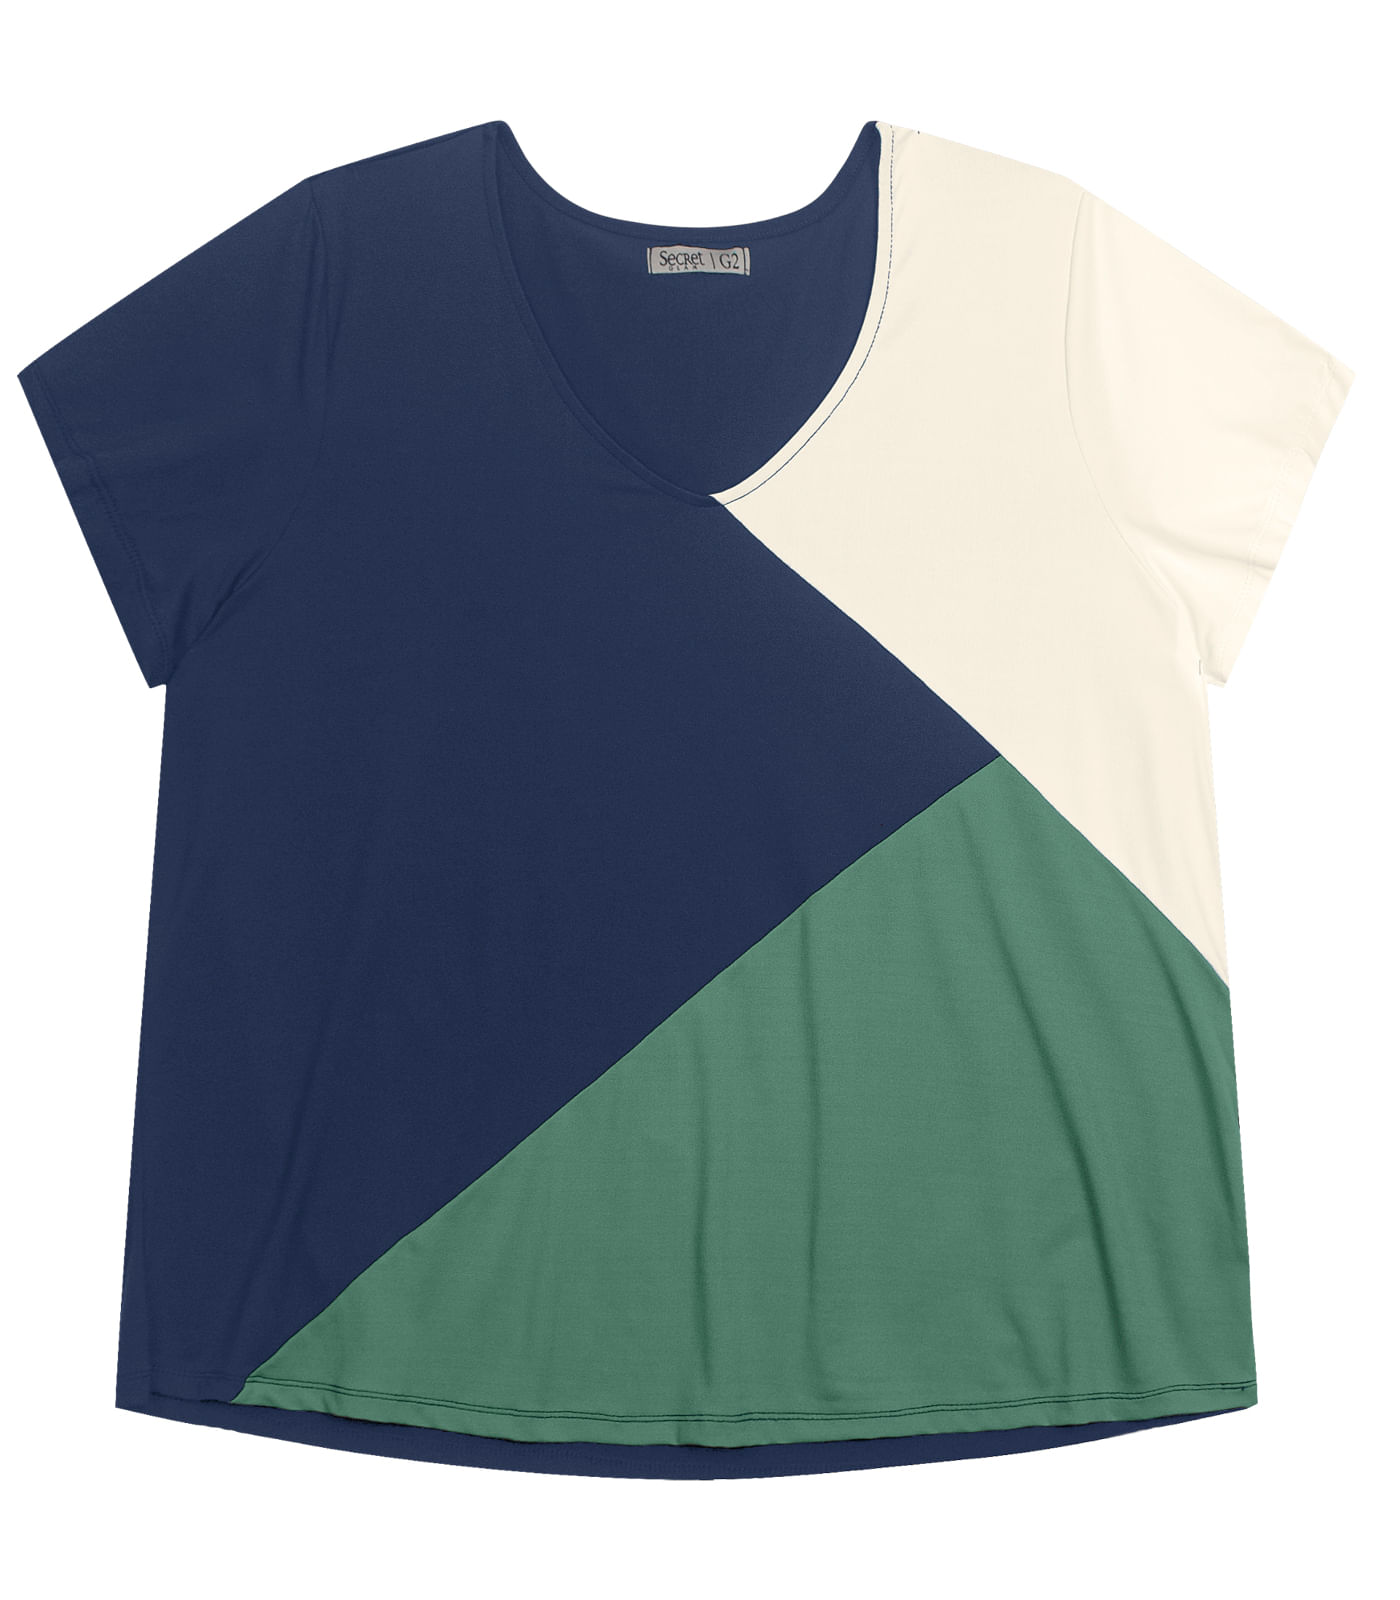 Blusa-Feminina-Plus-Size-Tricolor-Secret-Glam-Verde